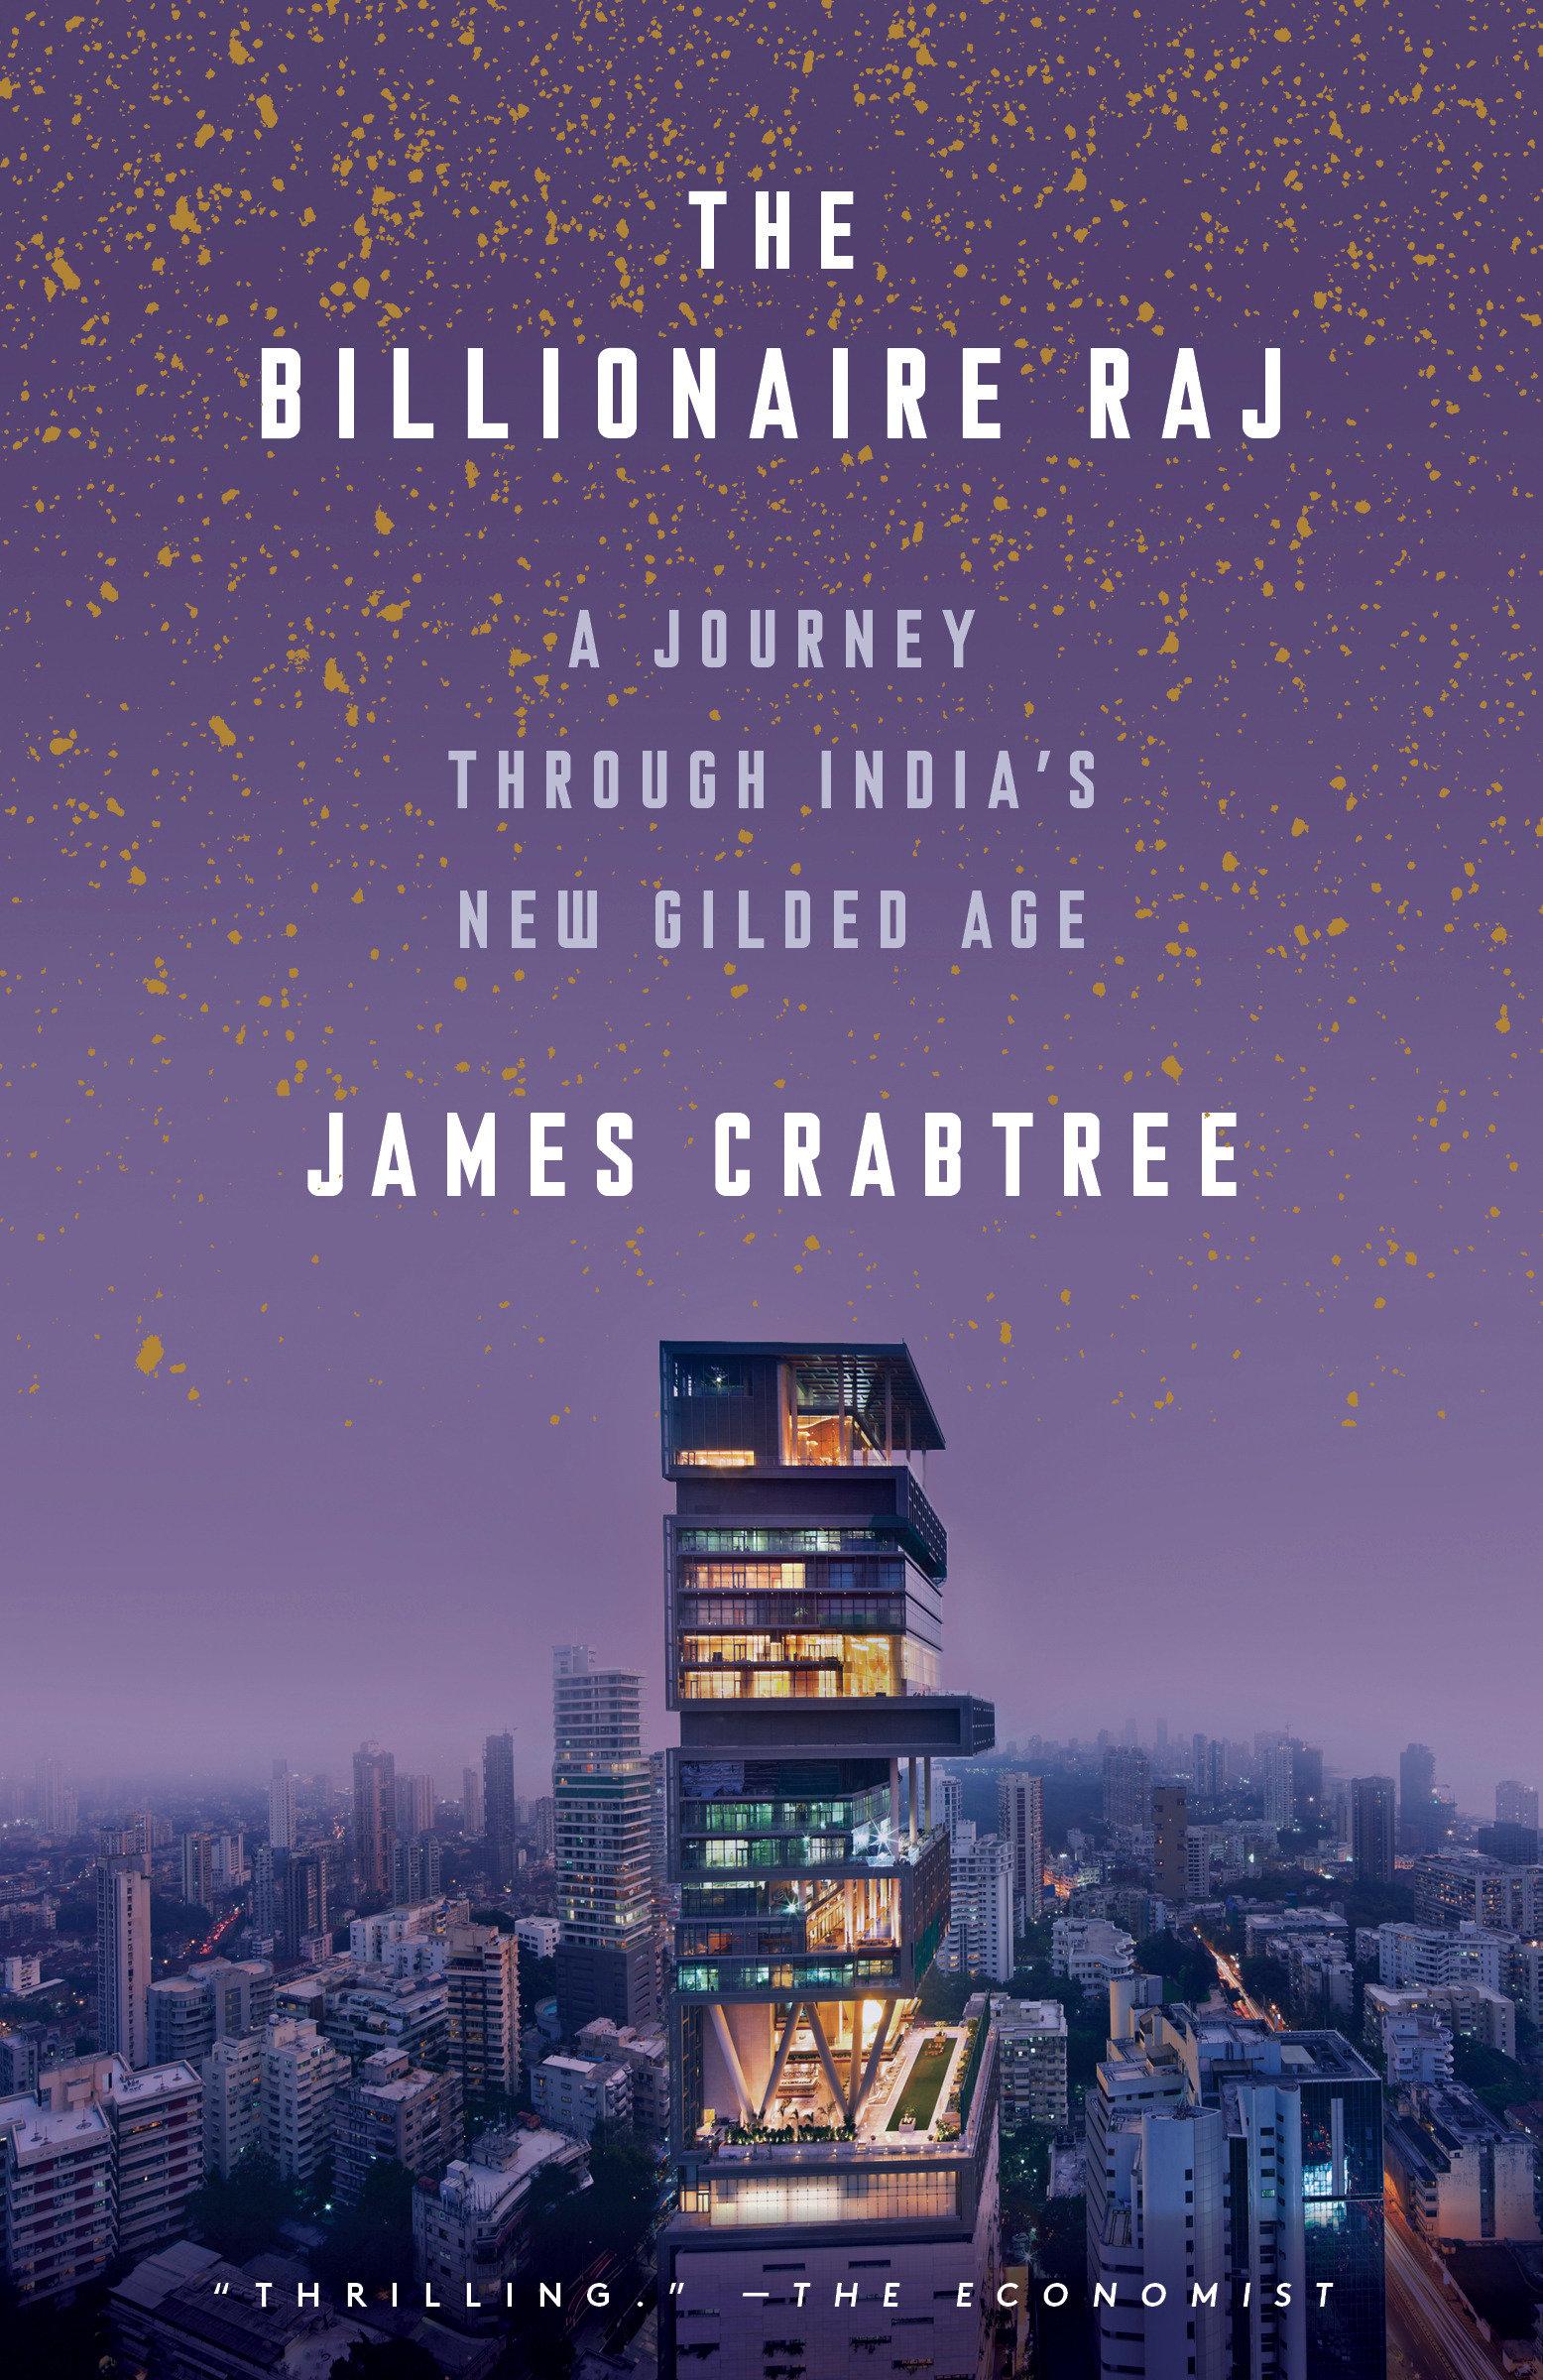 The Billionaire Raj A Journey Through India's New Gilded Age